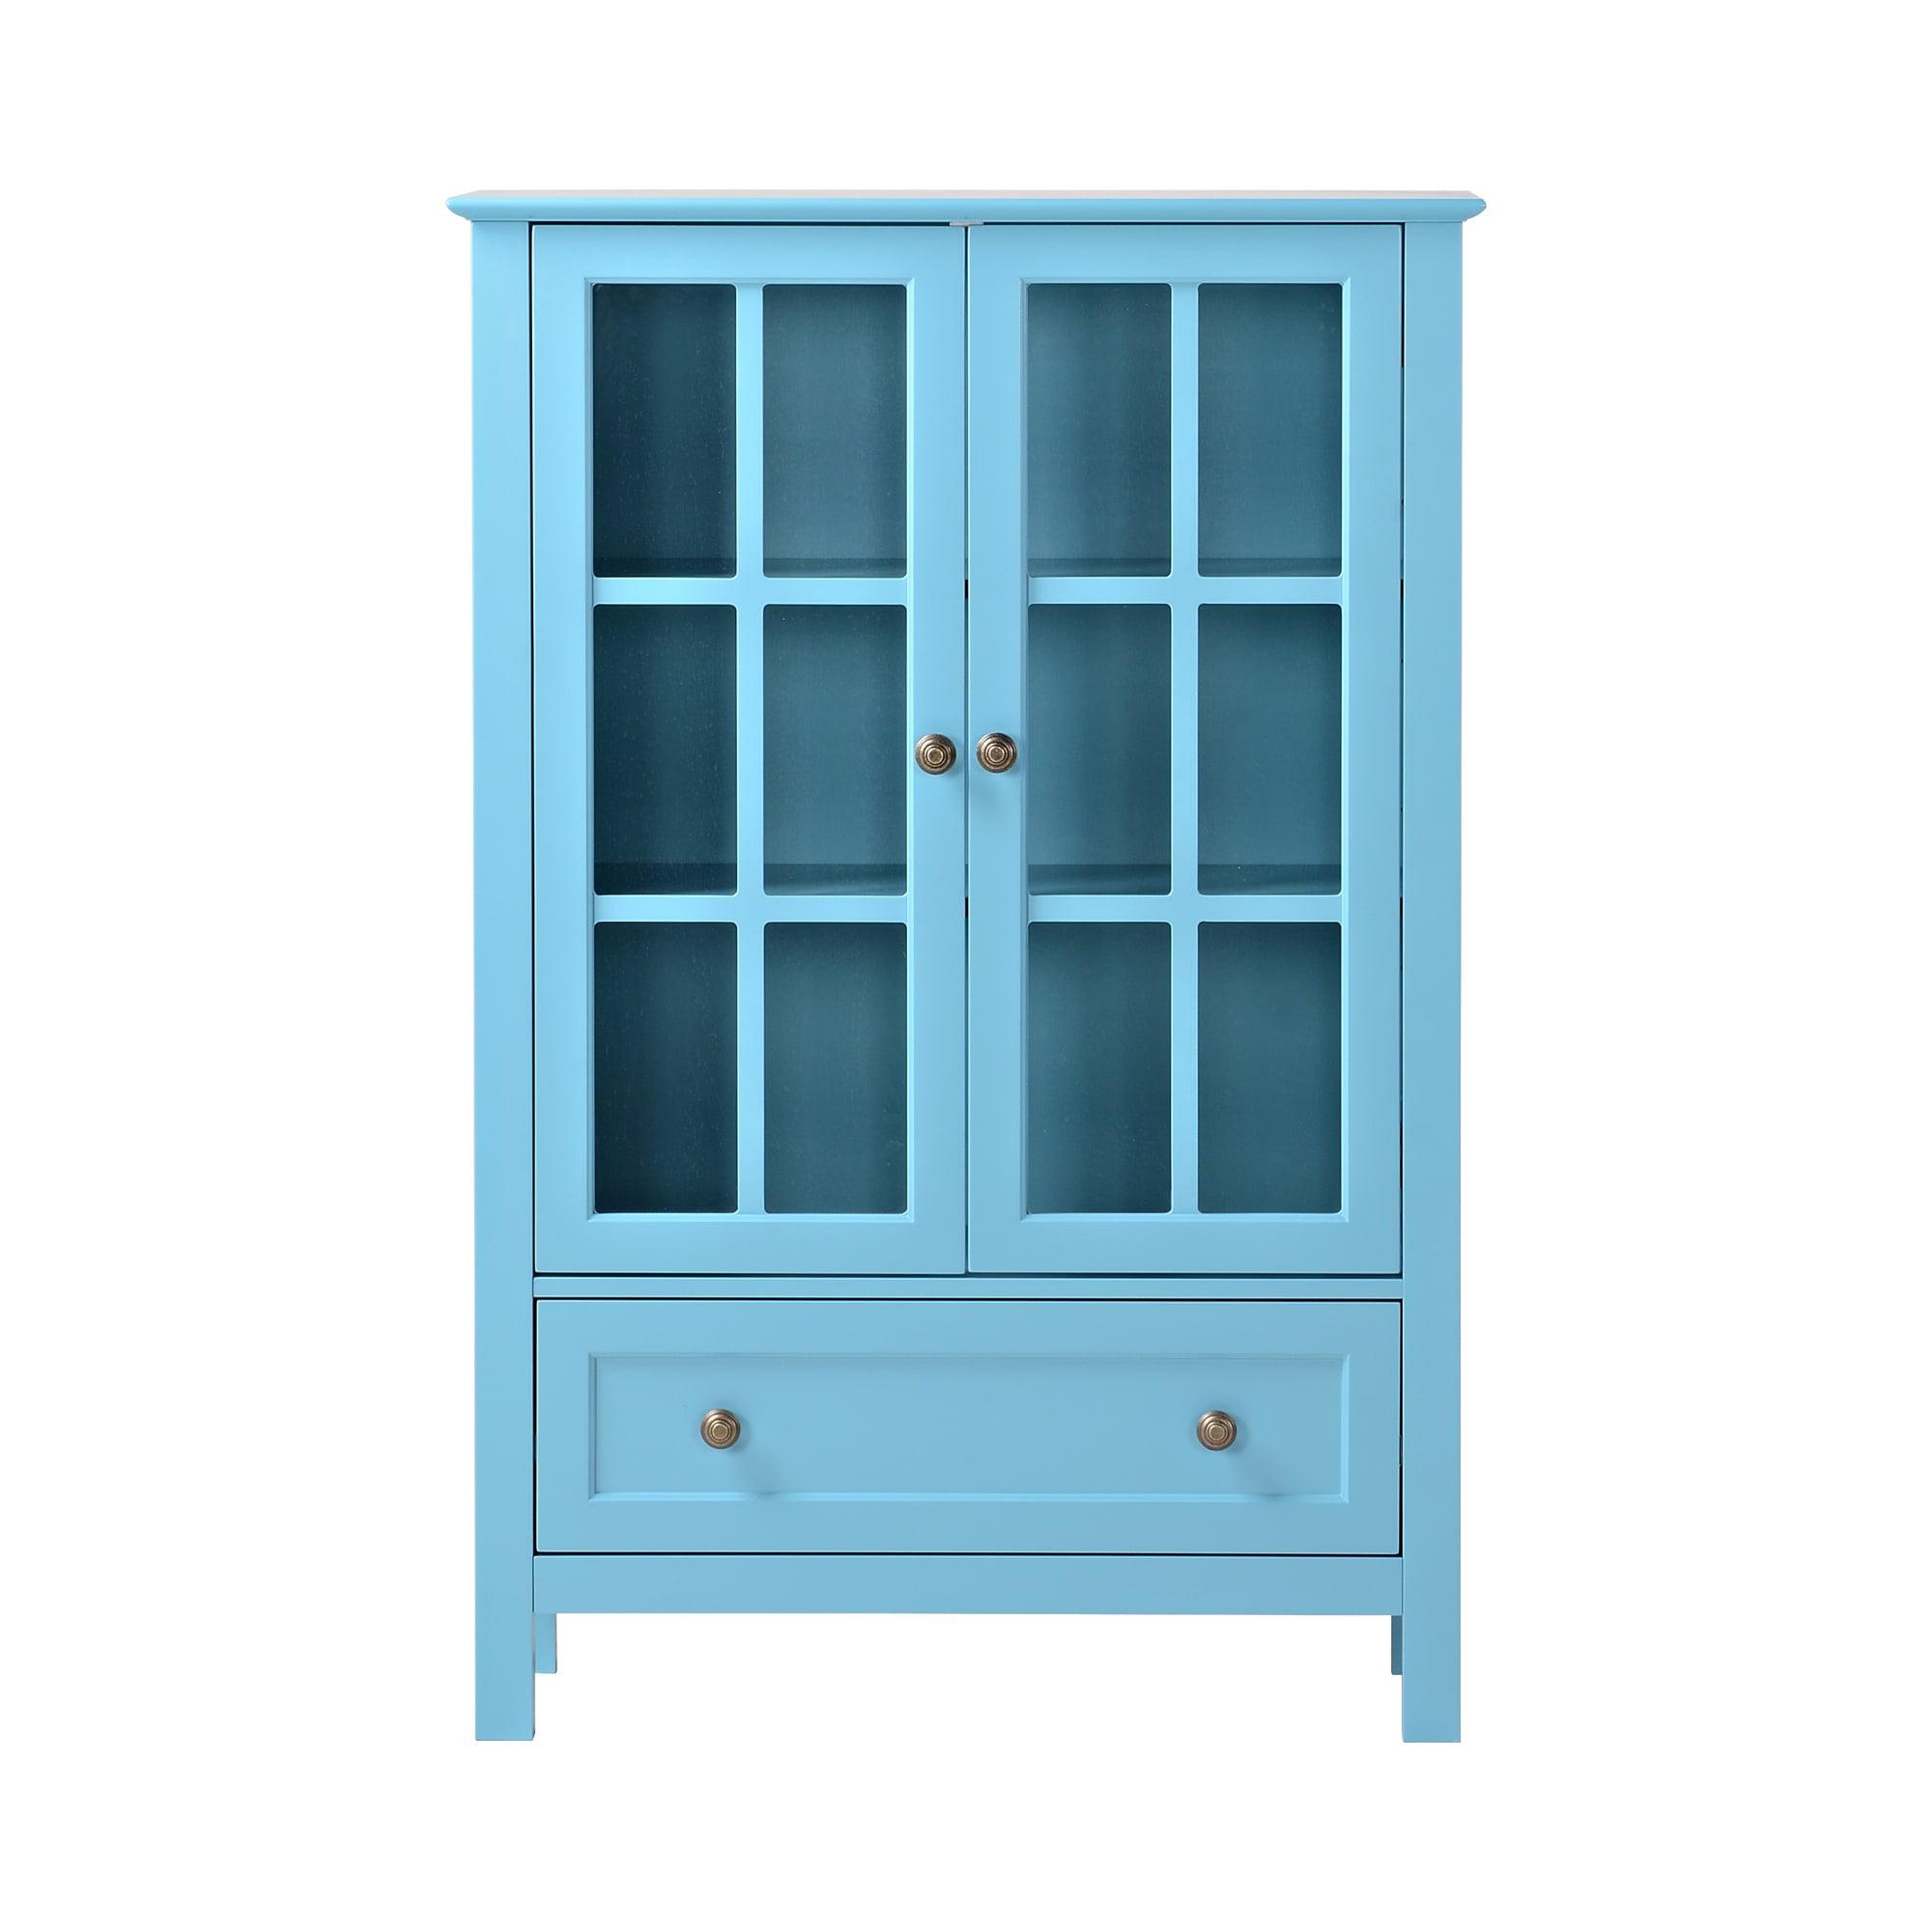 Homestar 2-Door/1-Drawer Glass Cabinet - Walmart.com